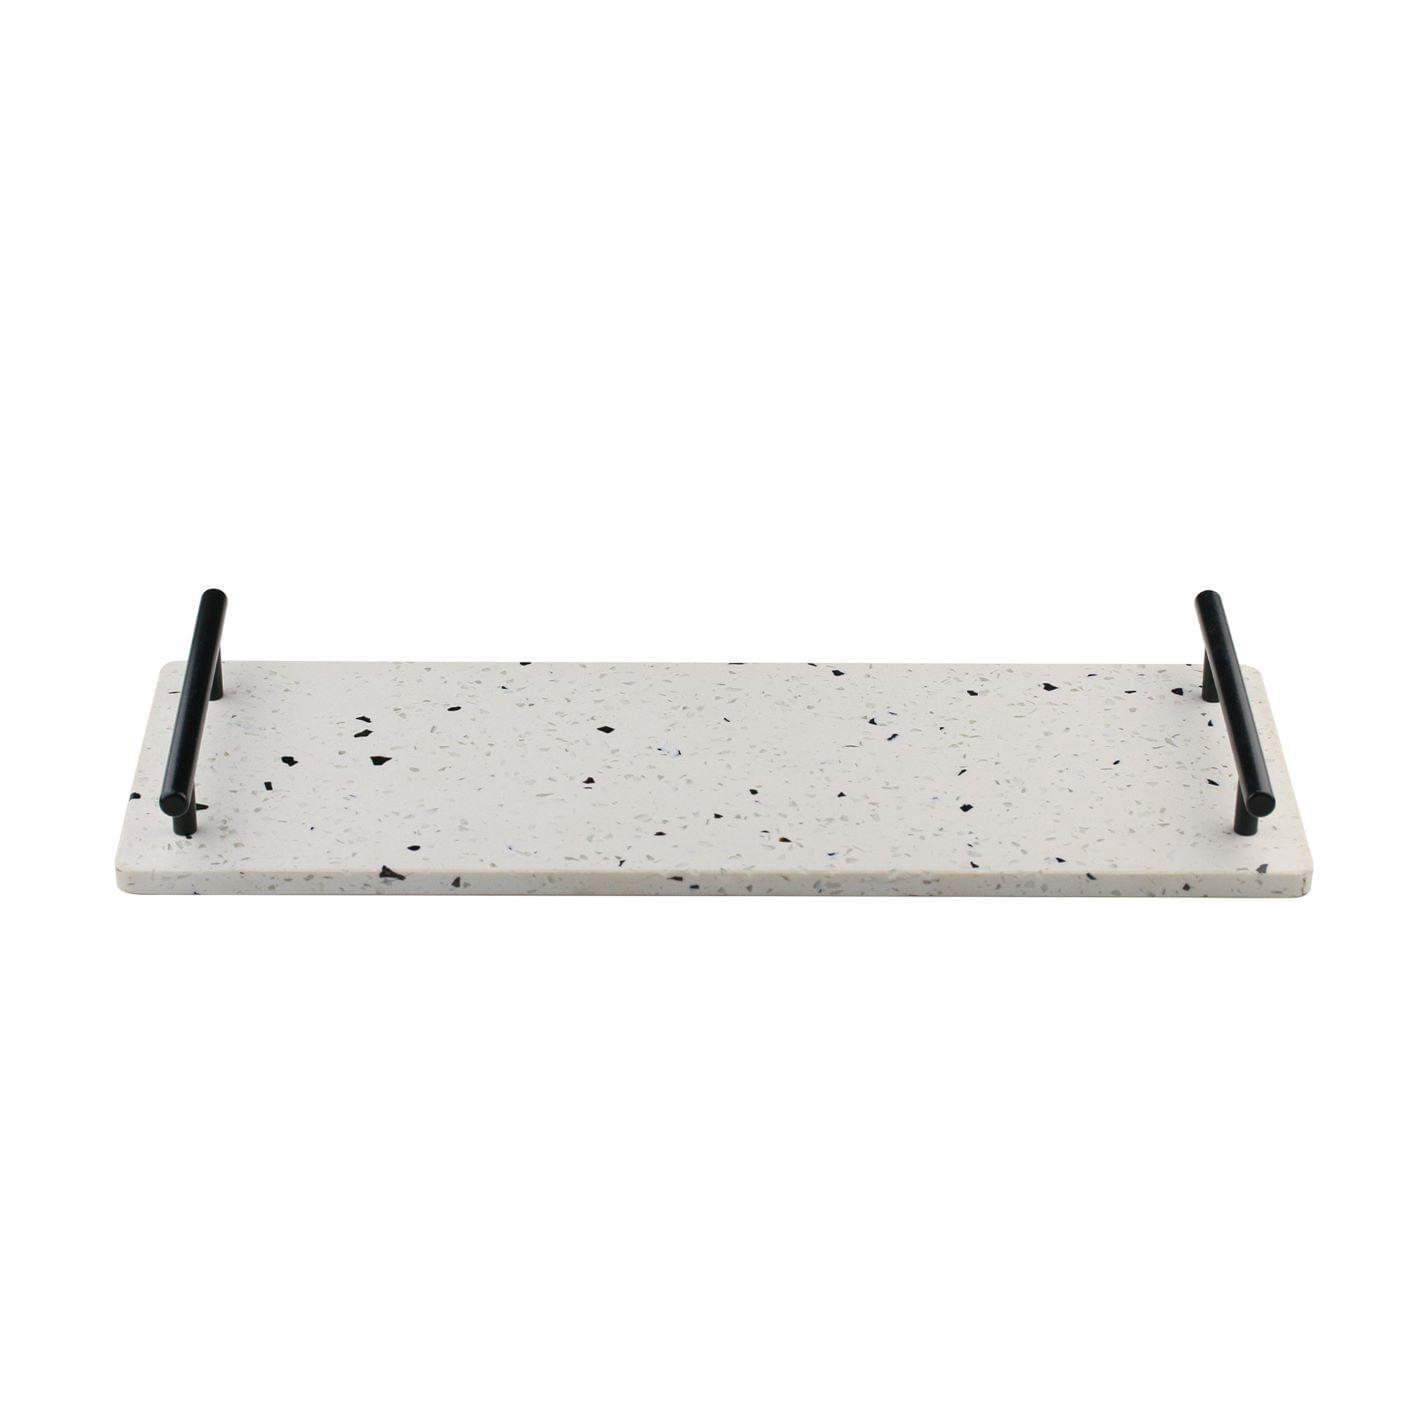 Bandeja de Mármore Terrazzo e Alças de Metal Preto - 40x15cm